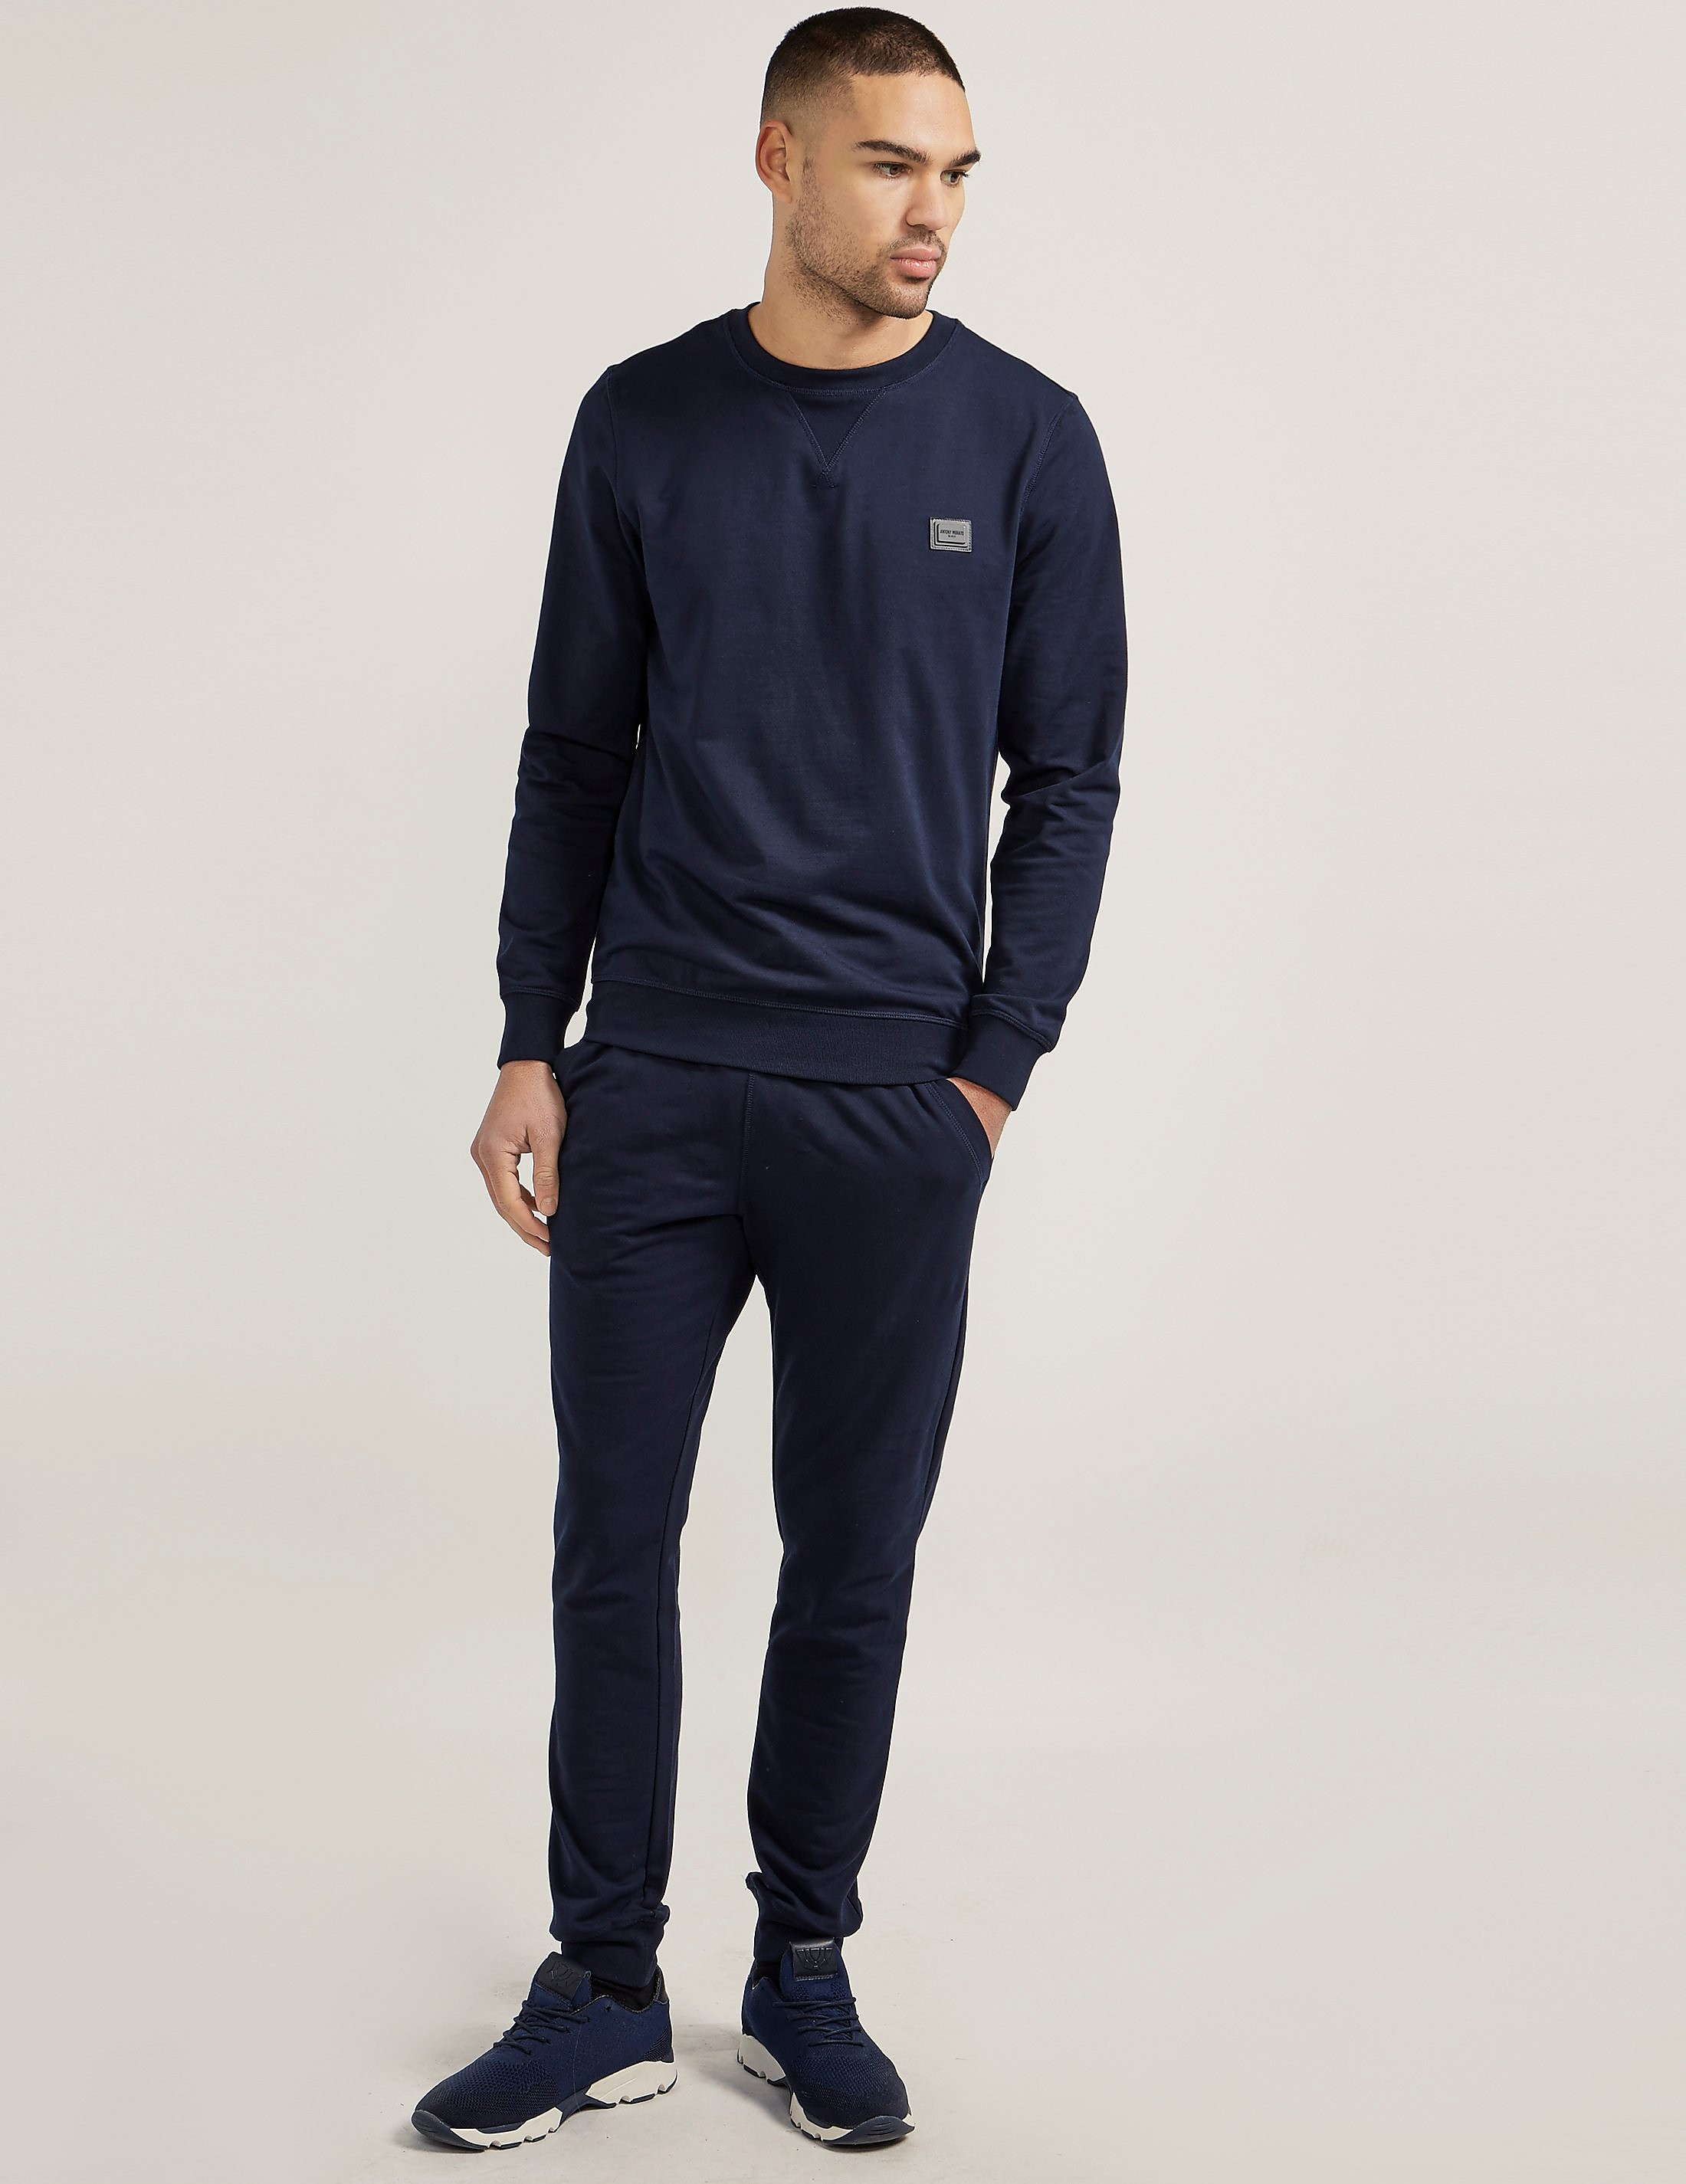 Antony Morato Pique Cotton Sweatshirt